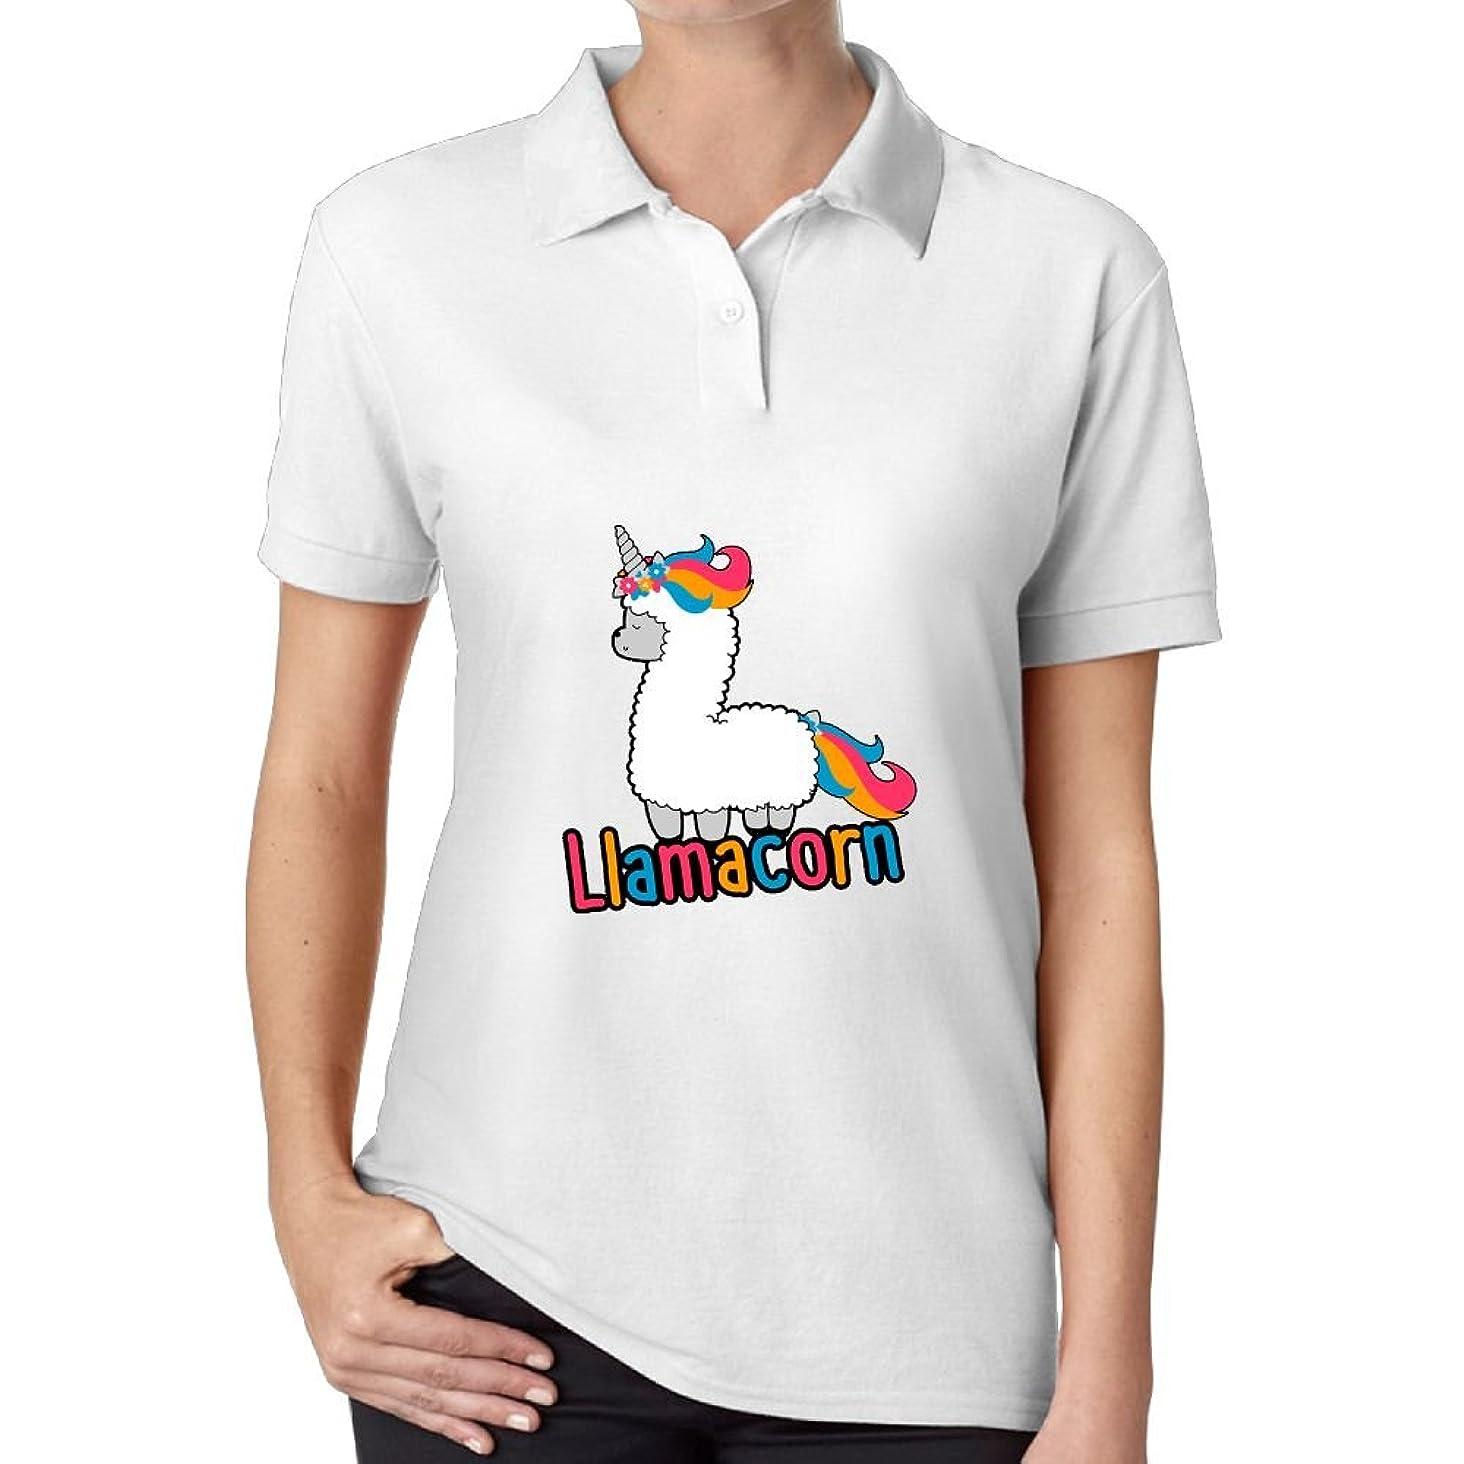 Mokjeiij Cute Llamacorn T-Shirt Men's Summer Womens Short Sleeves Comfortable and Sturdy Shirt Blouse T-Shirt Blouse.